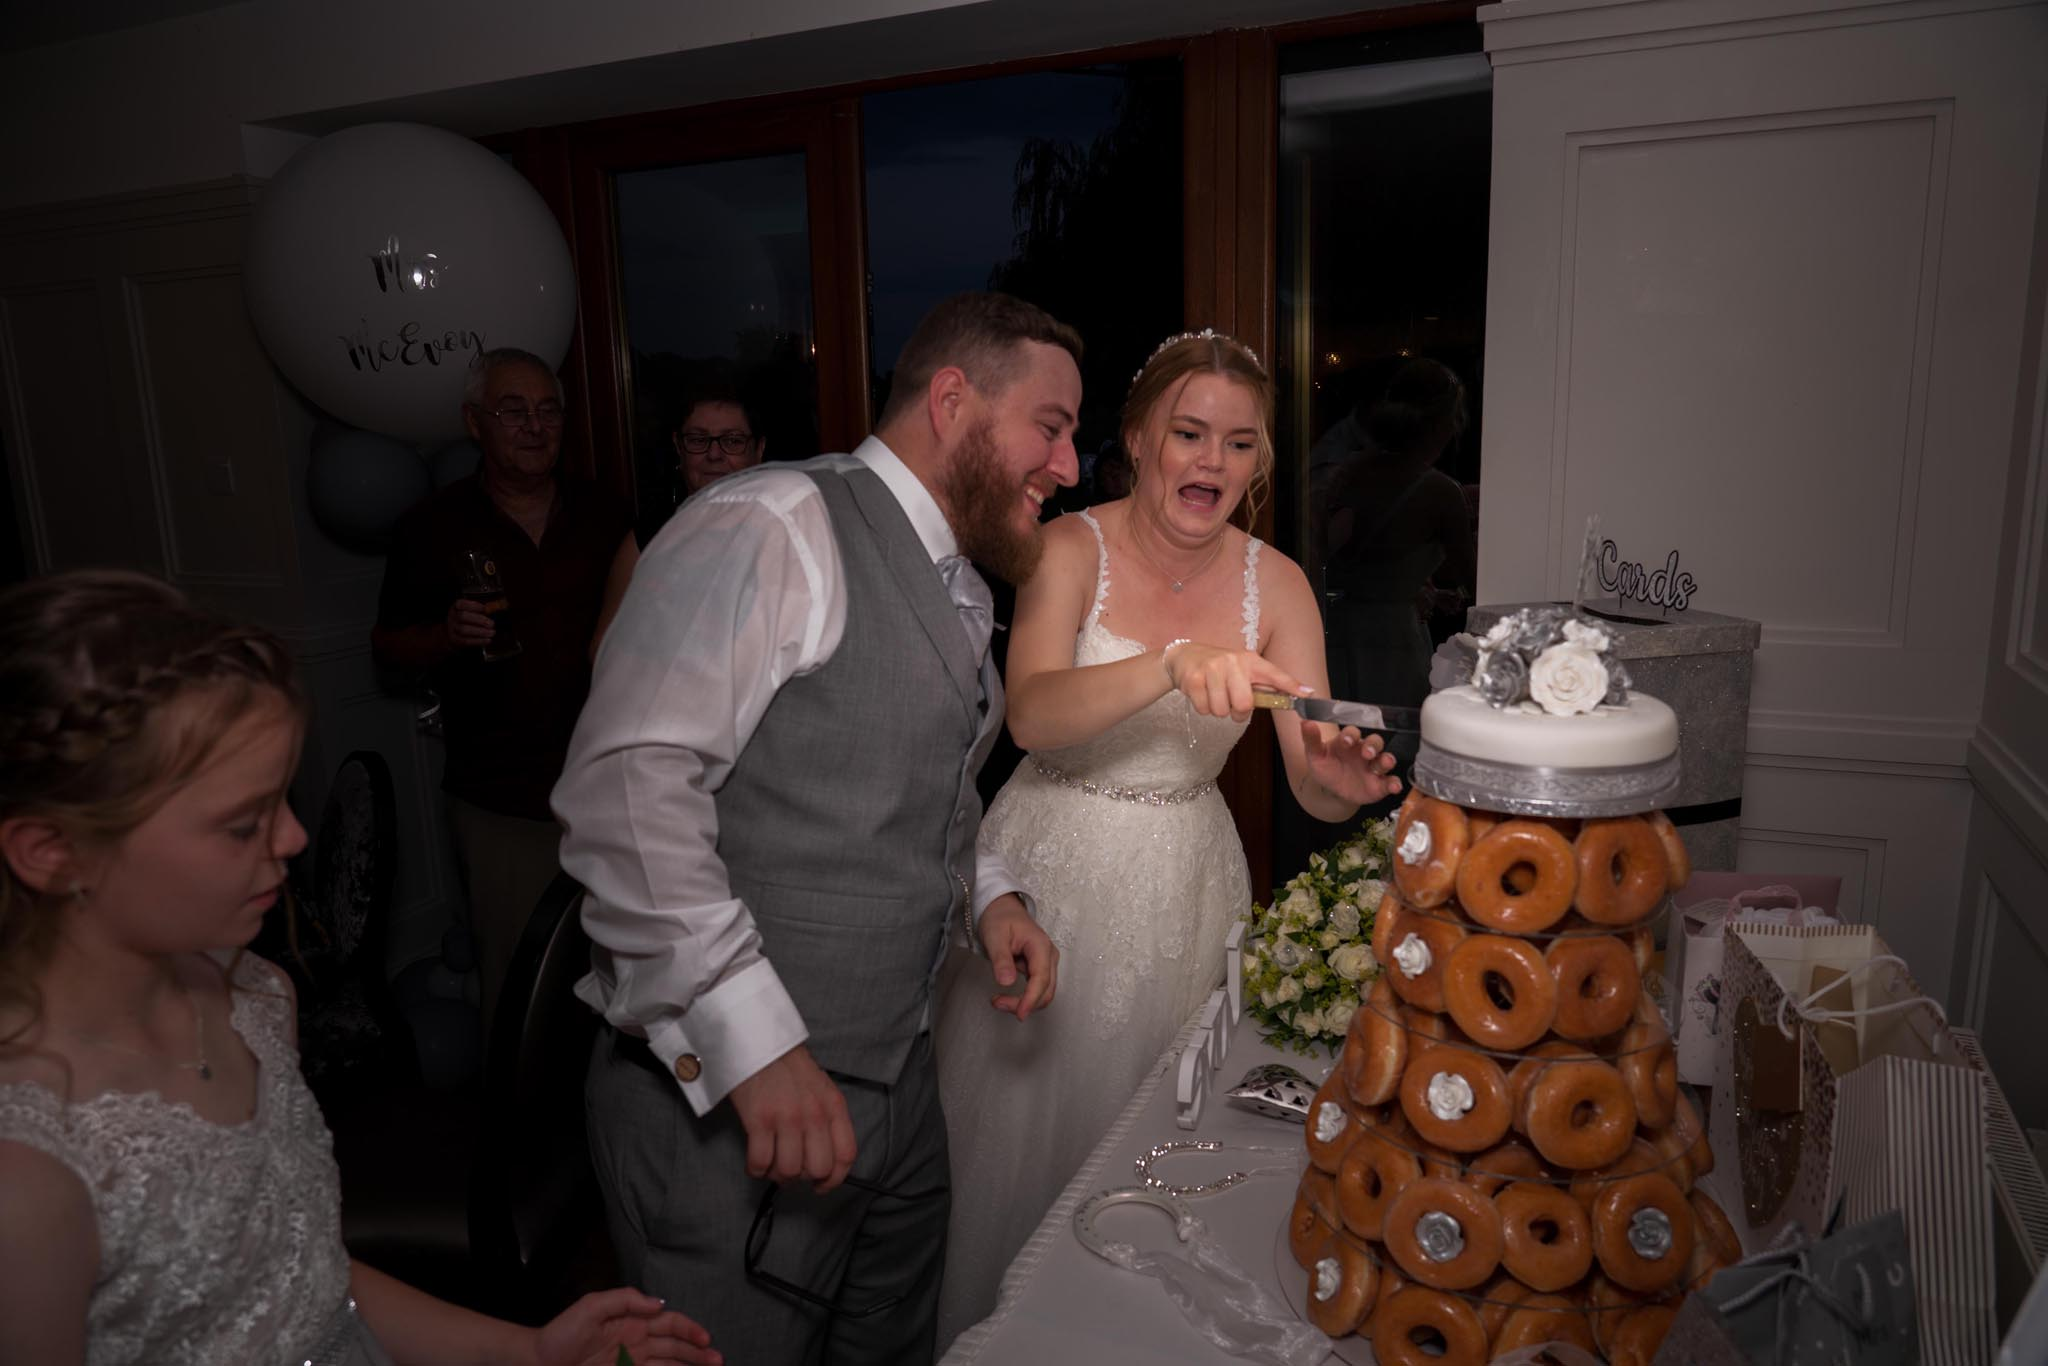 926-Night-Reception-Luke-Yasmin-The-Rayleigh-Club-Wedding-Photography.jpg